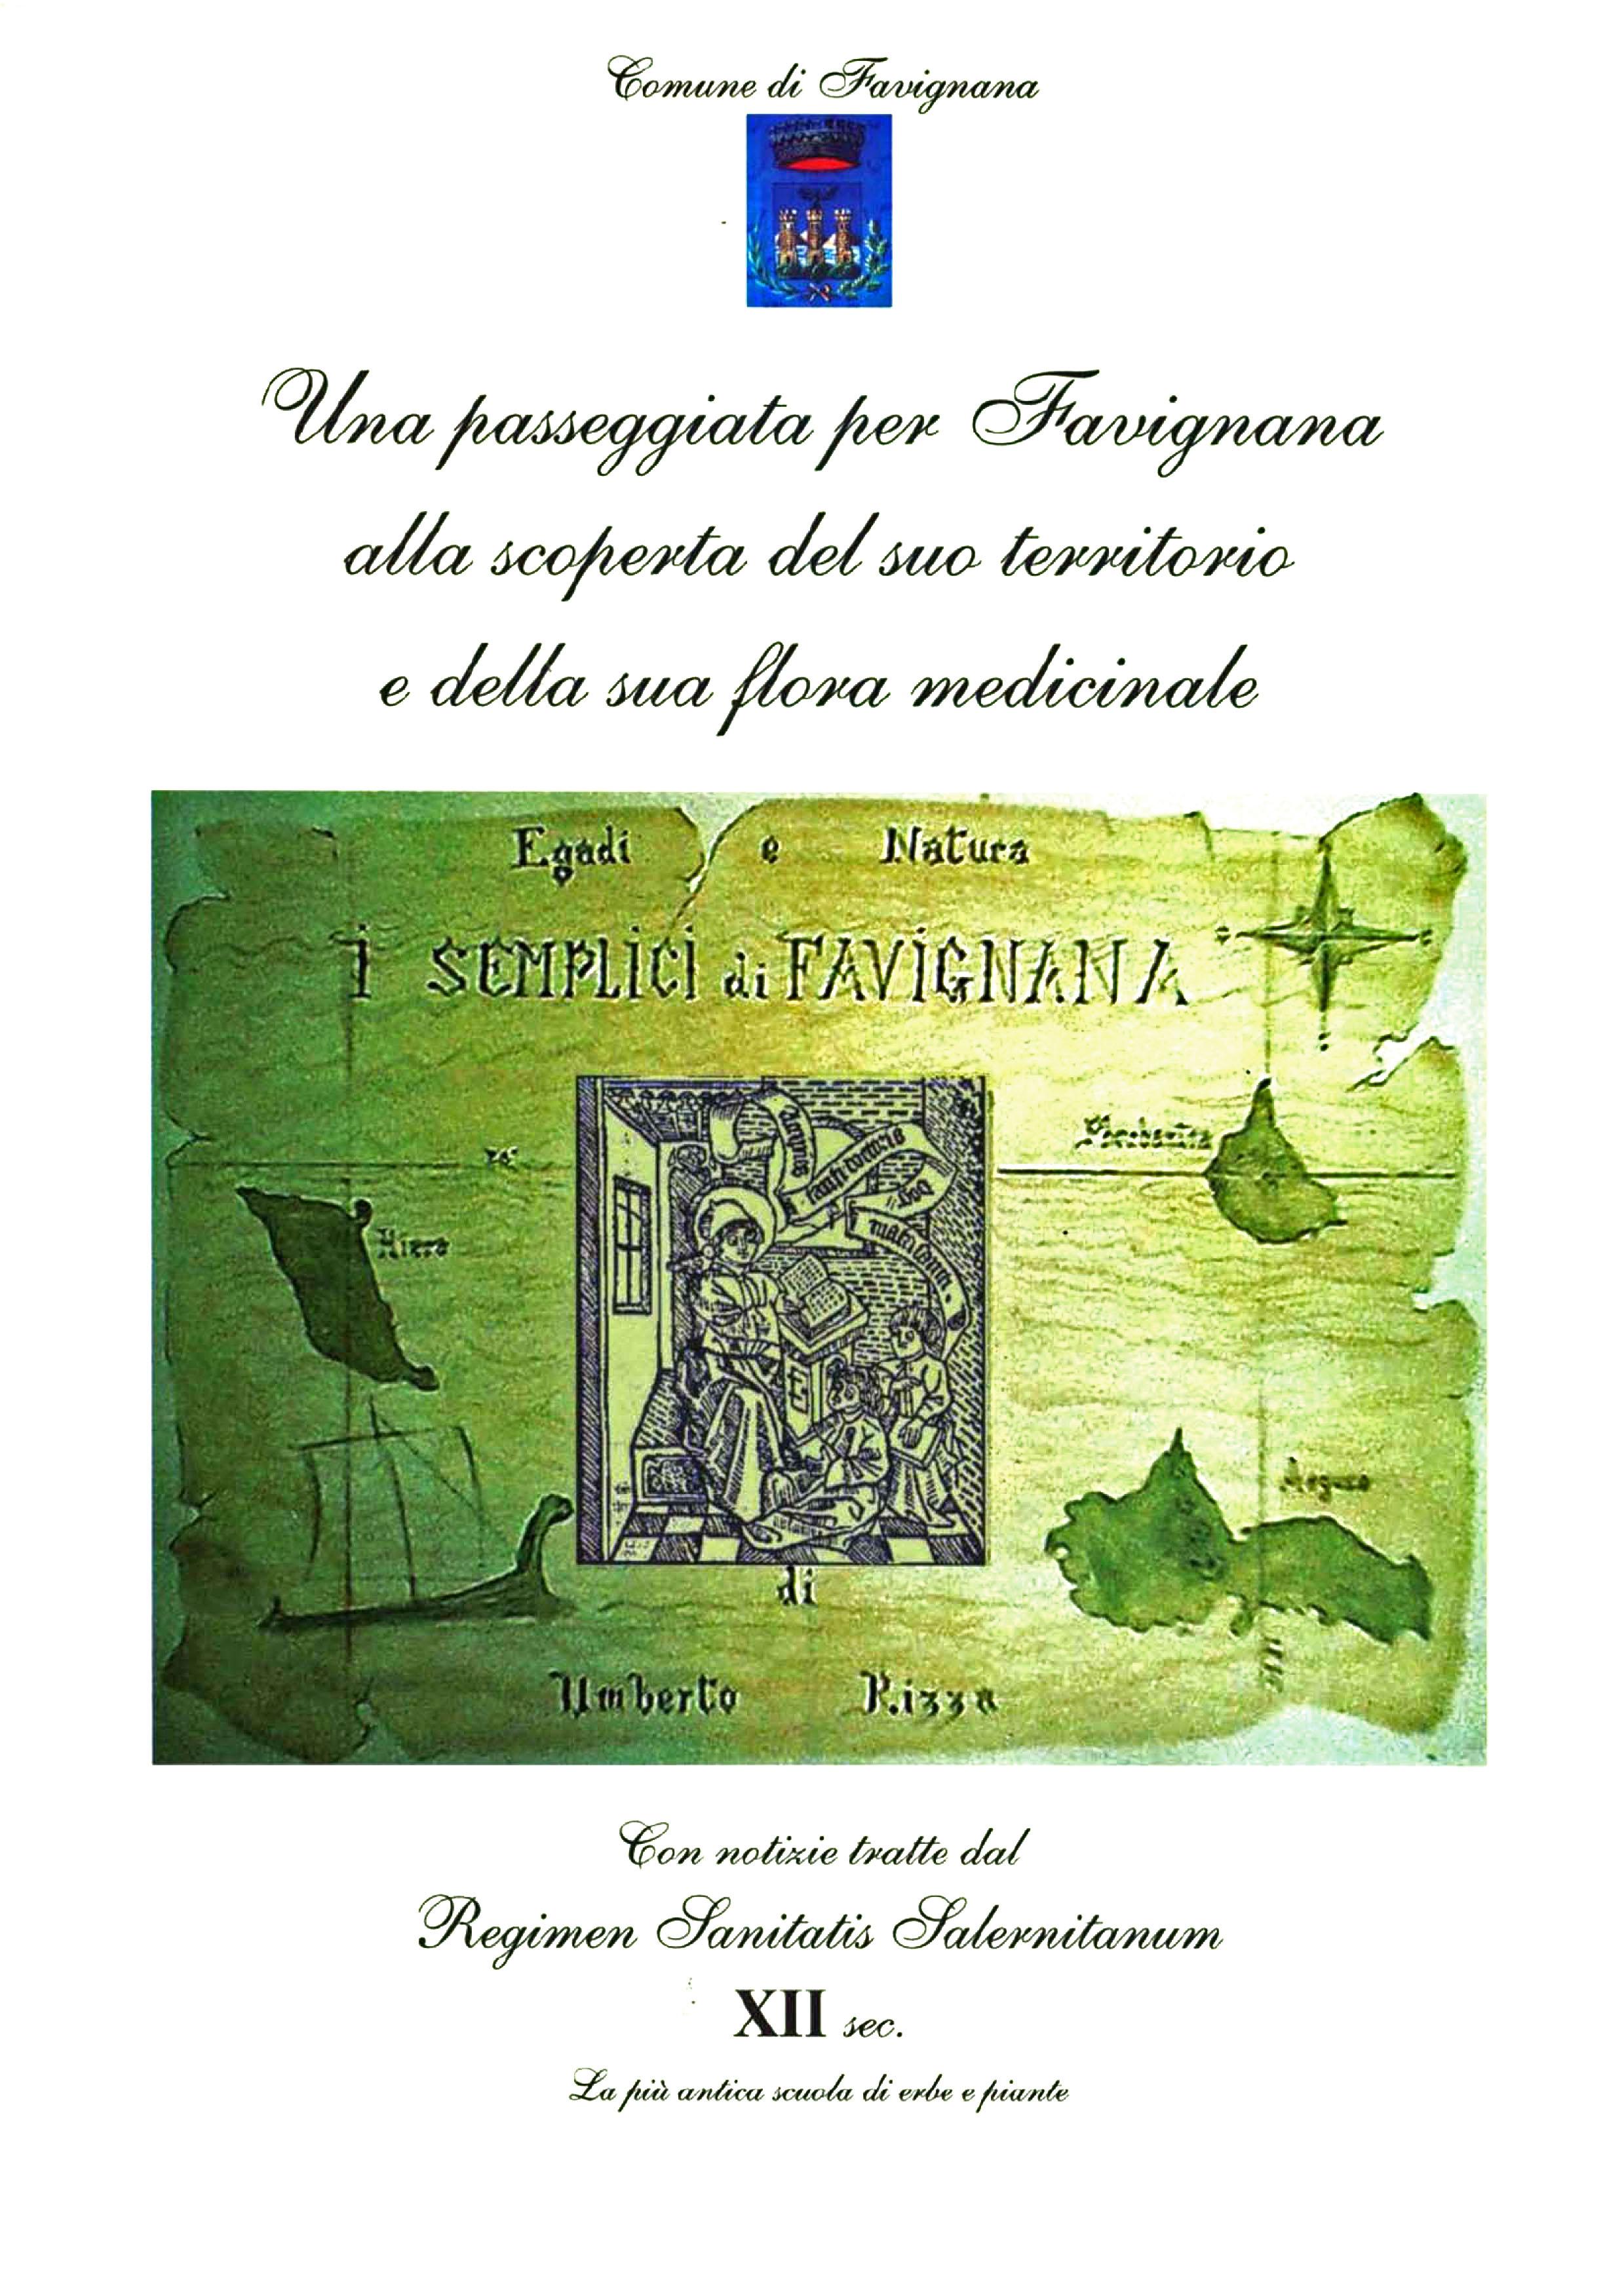 altra foto I semplici di Favignana